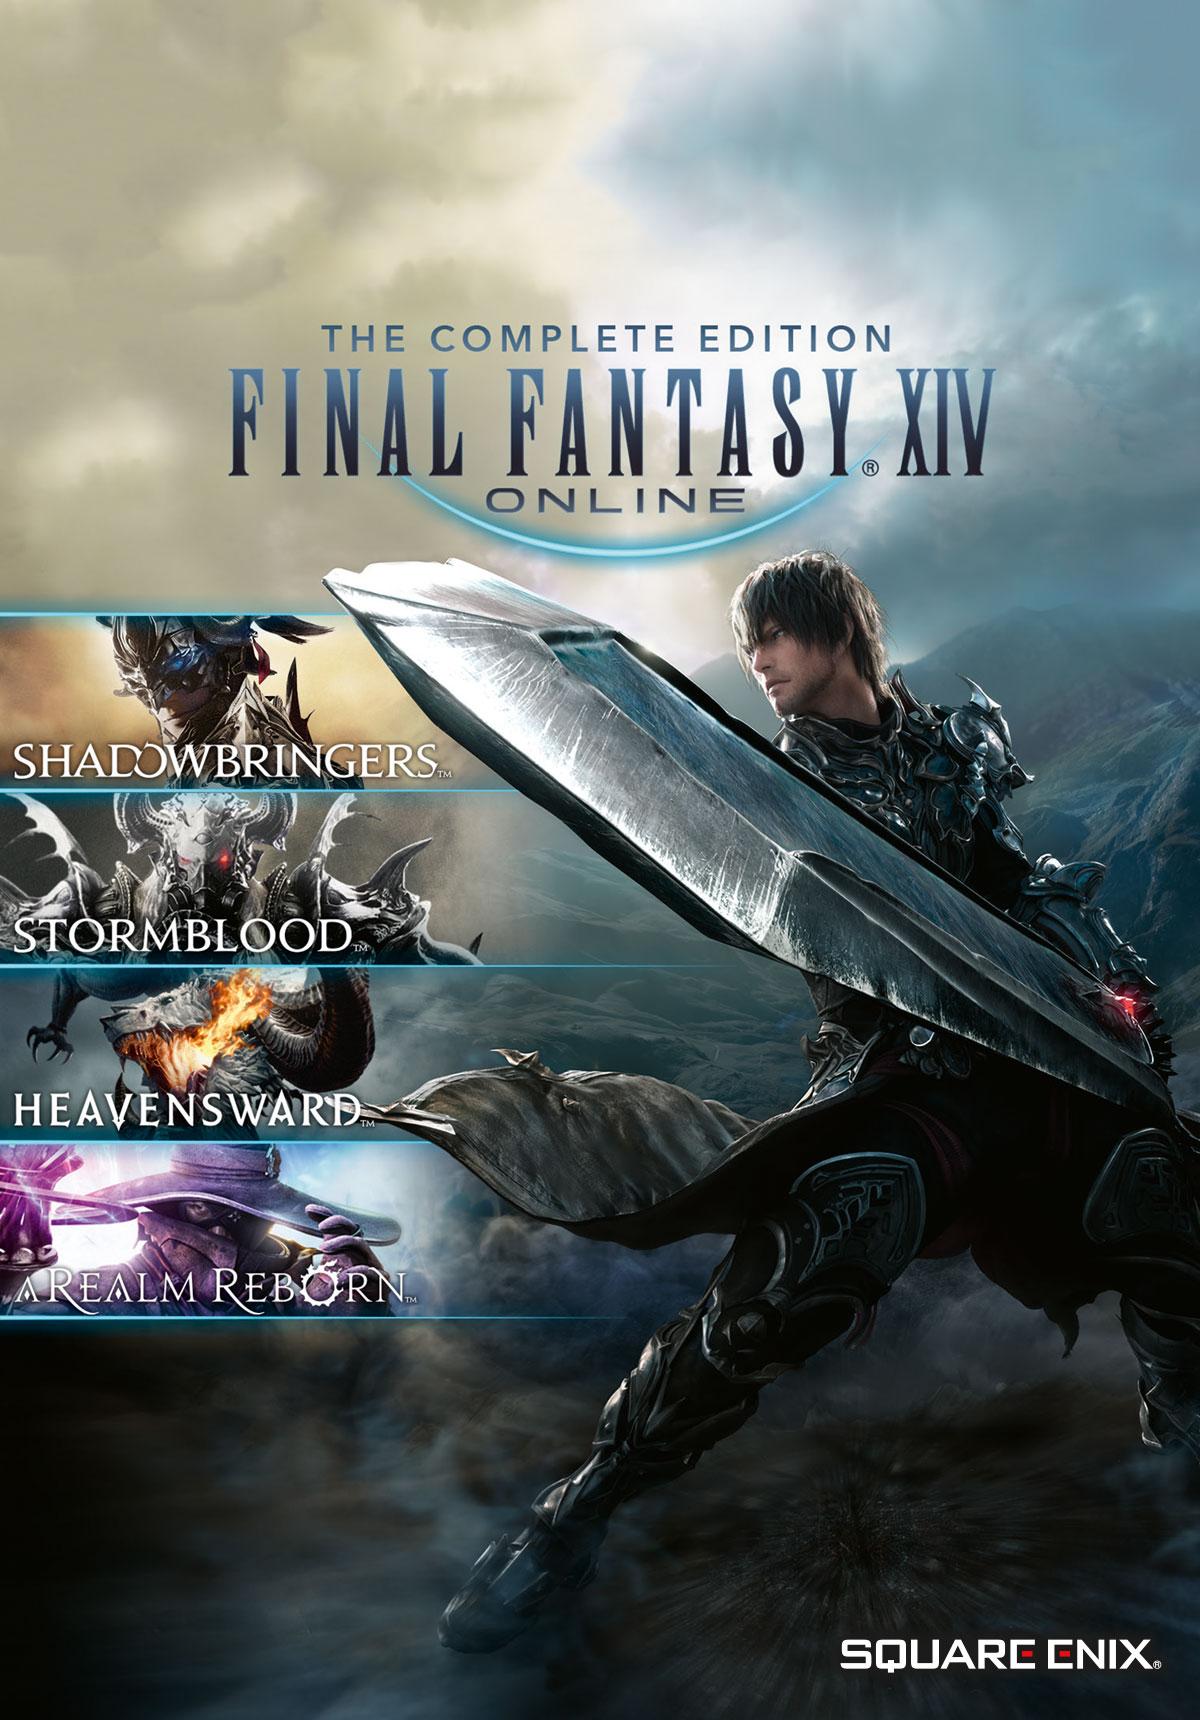 Final Fantasy® XIV Online Complete Edition [PC Download] - £17.49 @ Square Enix